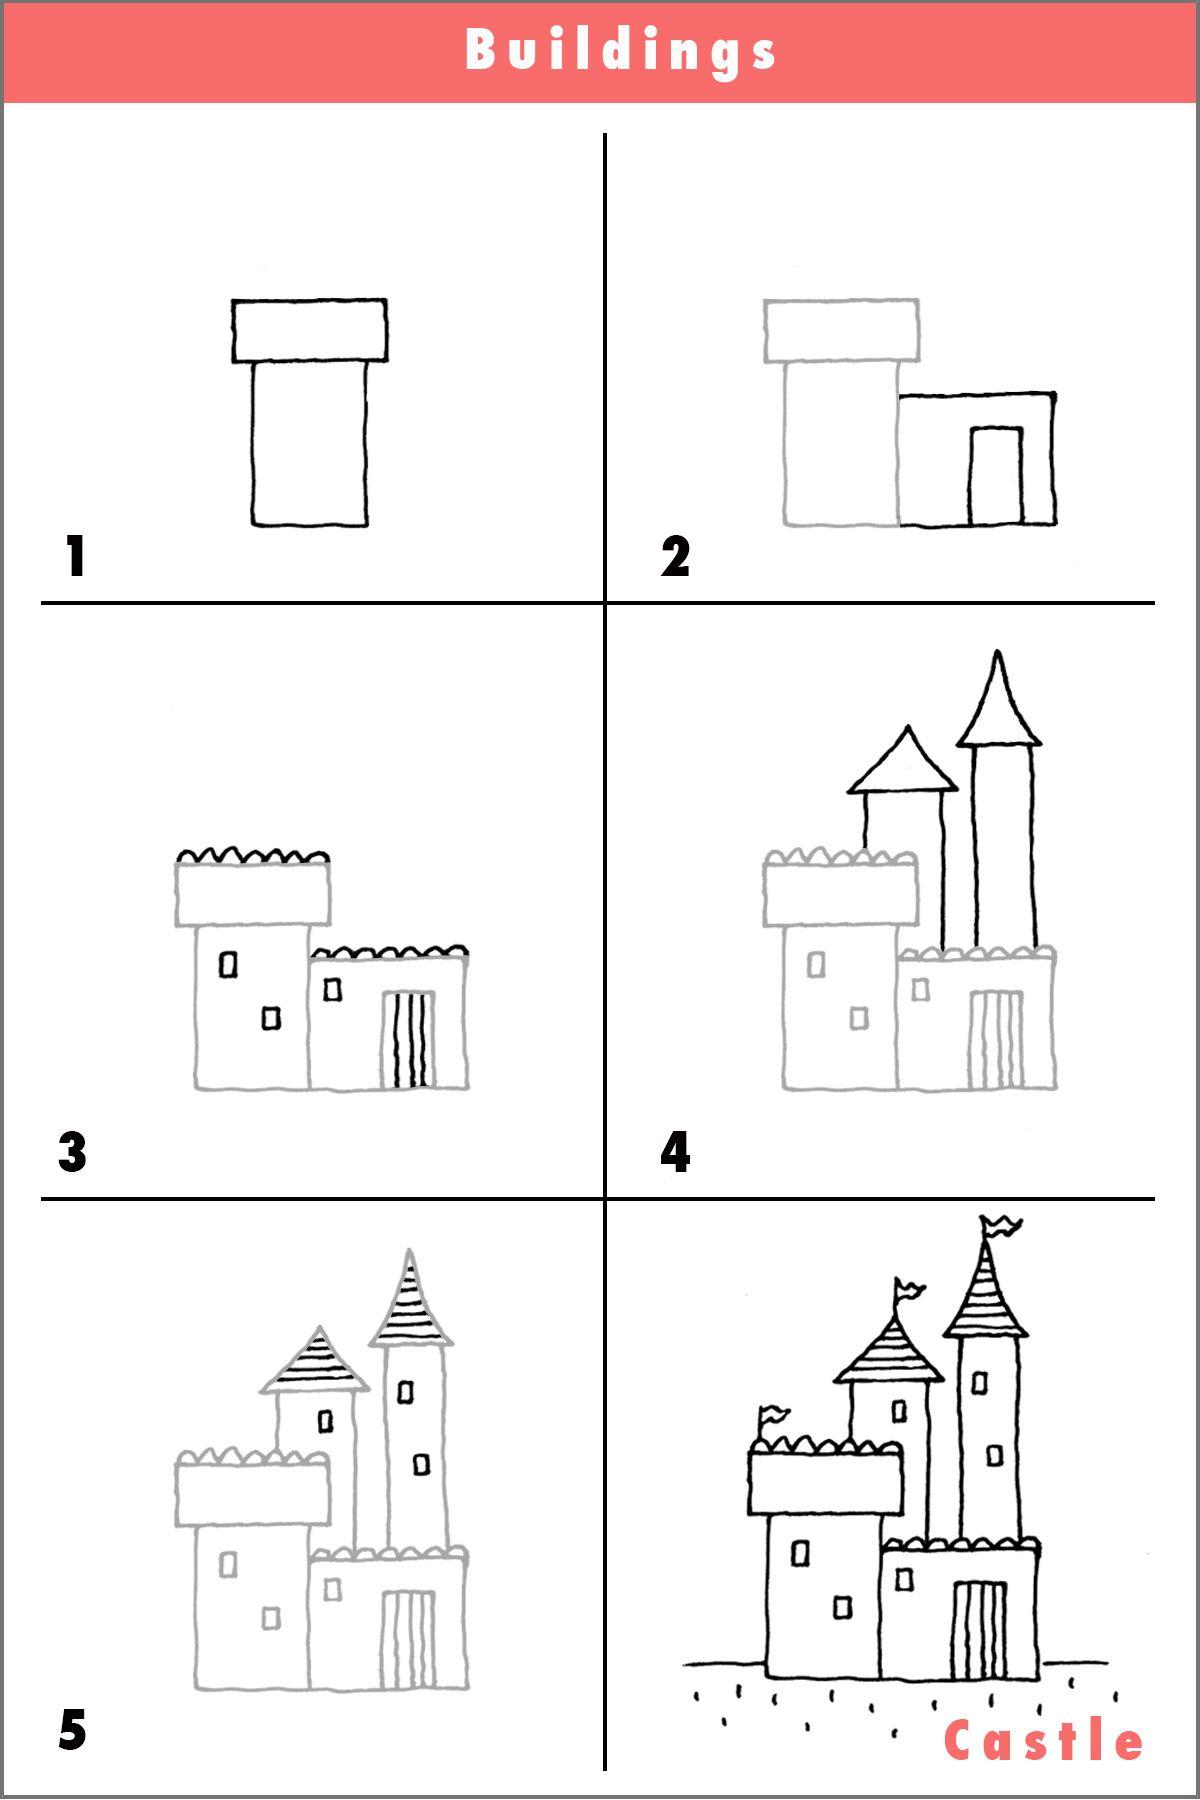 Apprendre A Dessiner Un Chateau Apprendre A Dessiner Dessin